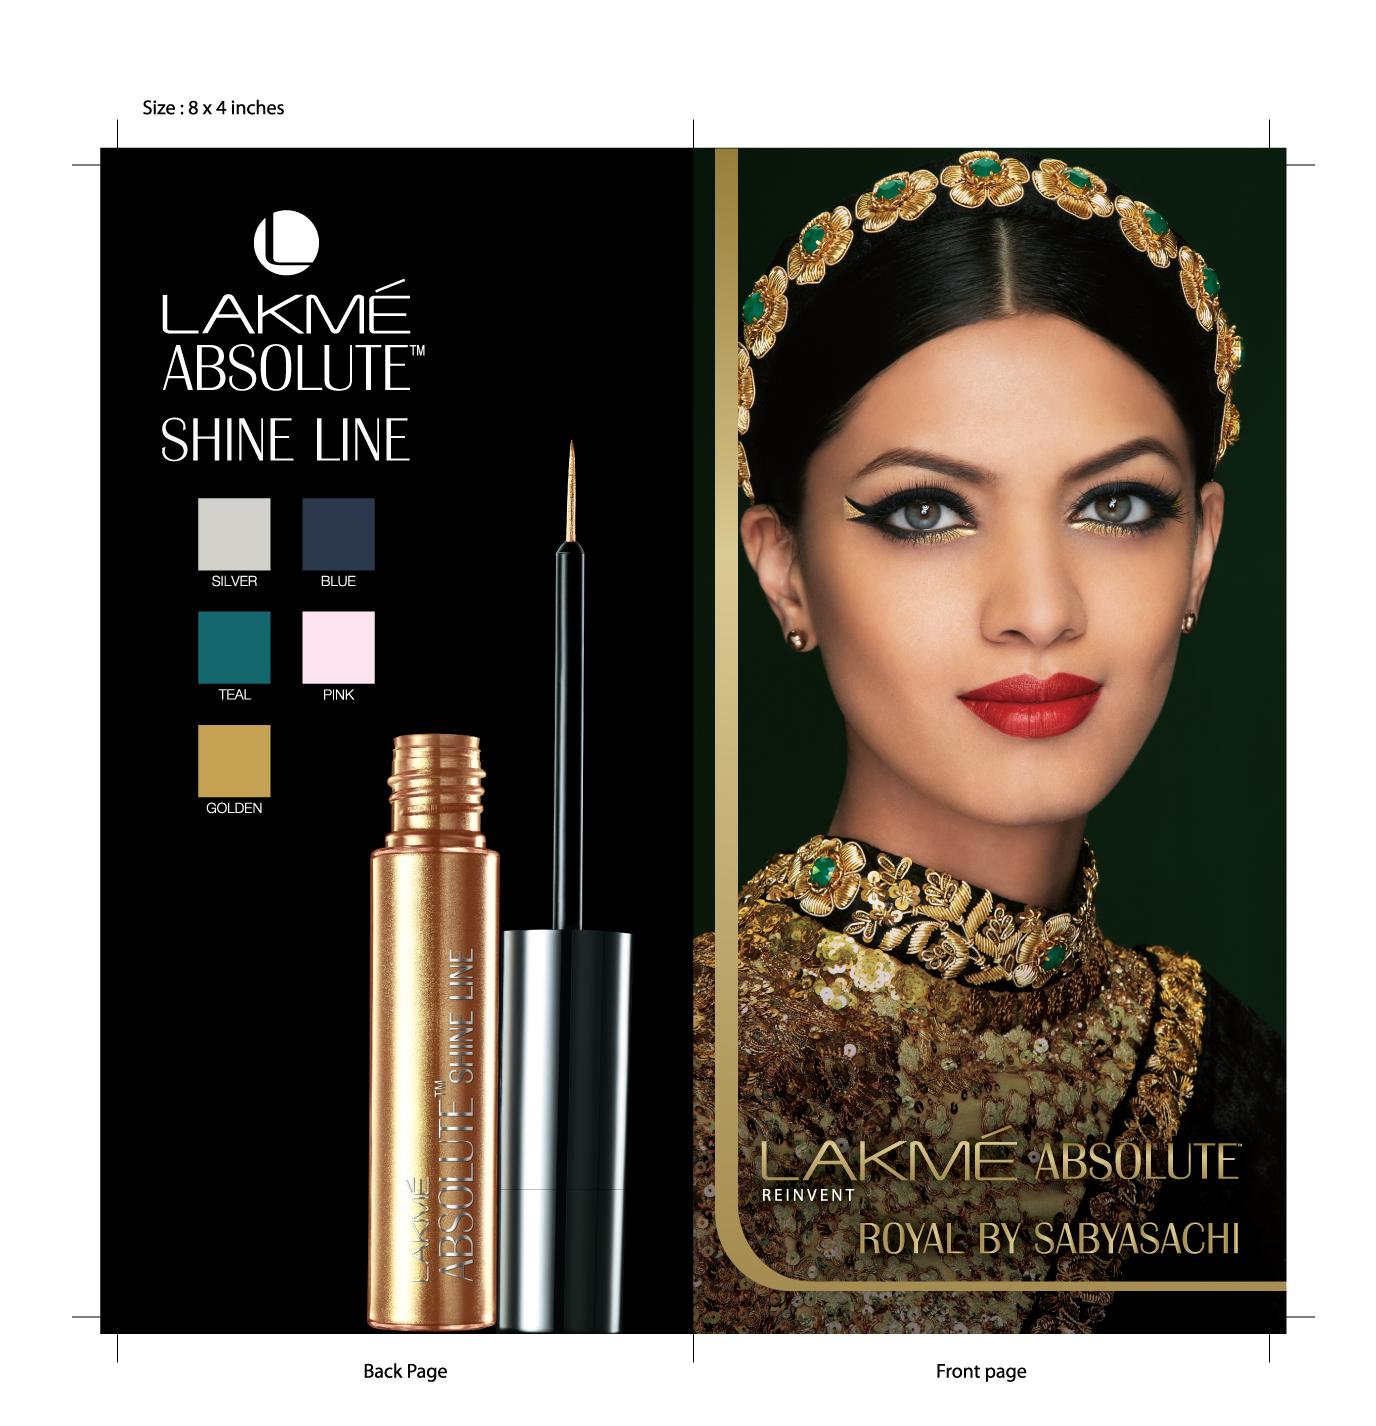 Lakme Absolute Royal_Shade Card 1 - The Indian Beauty Blog